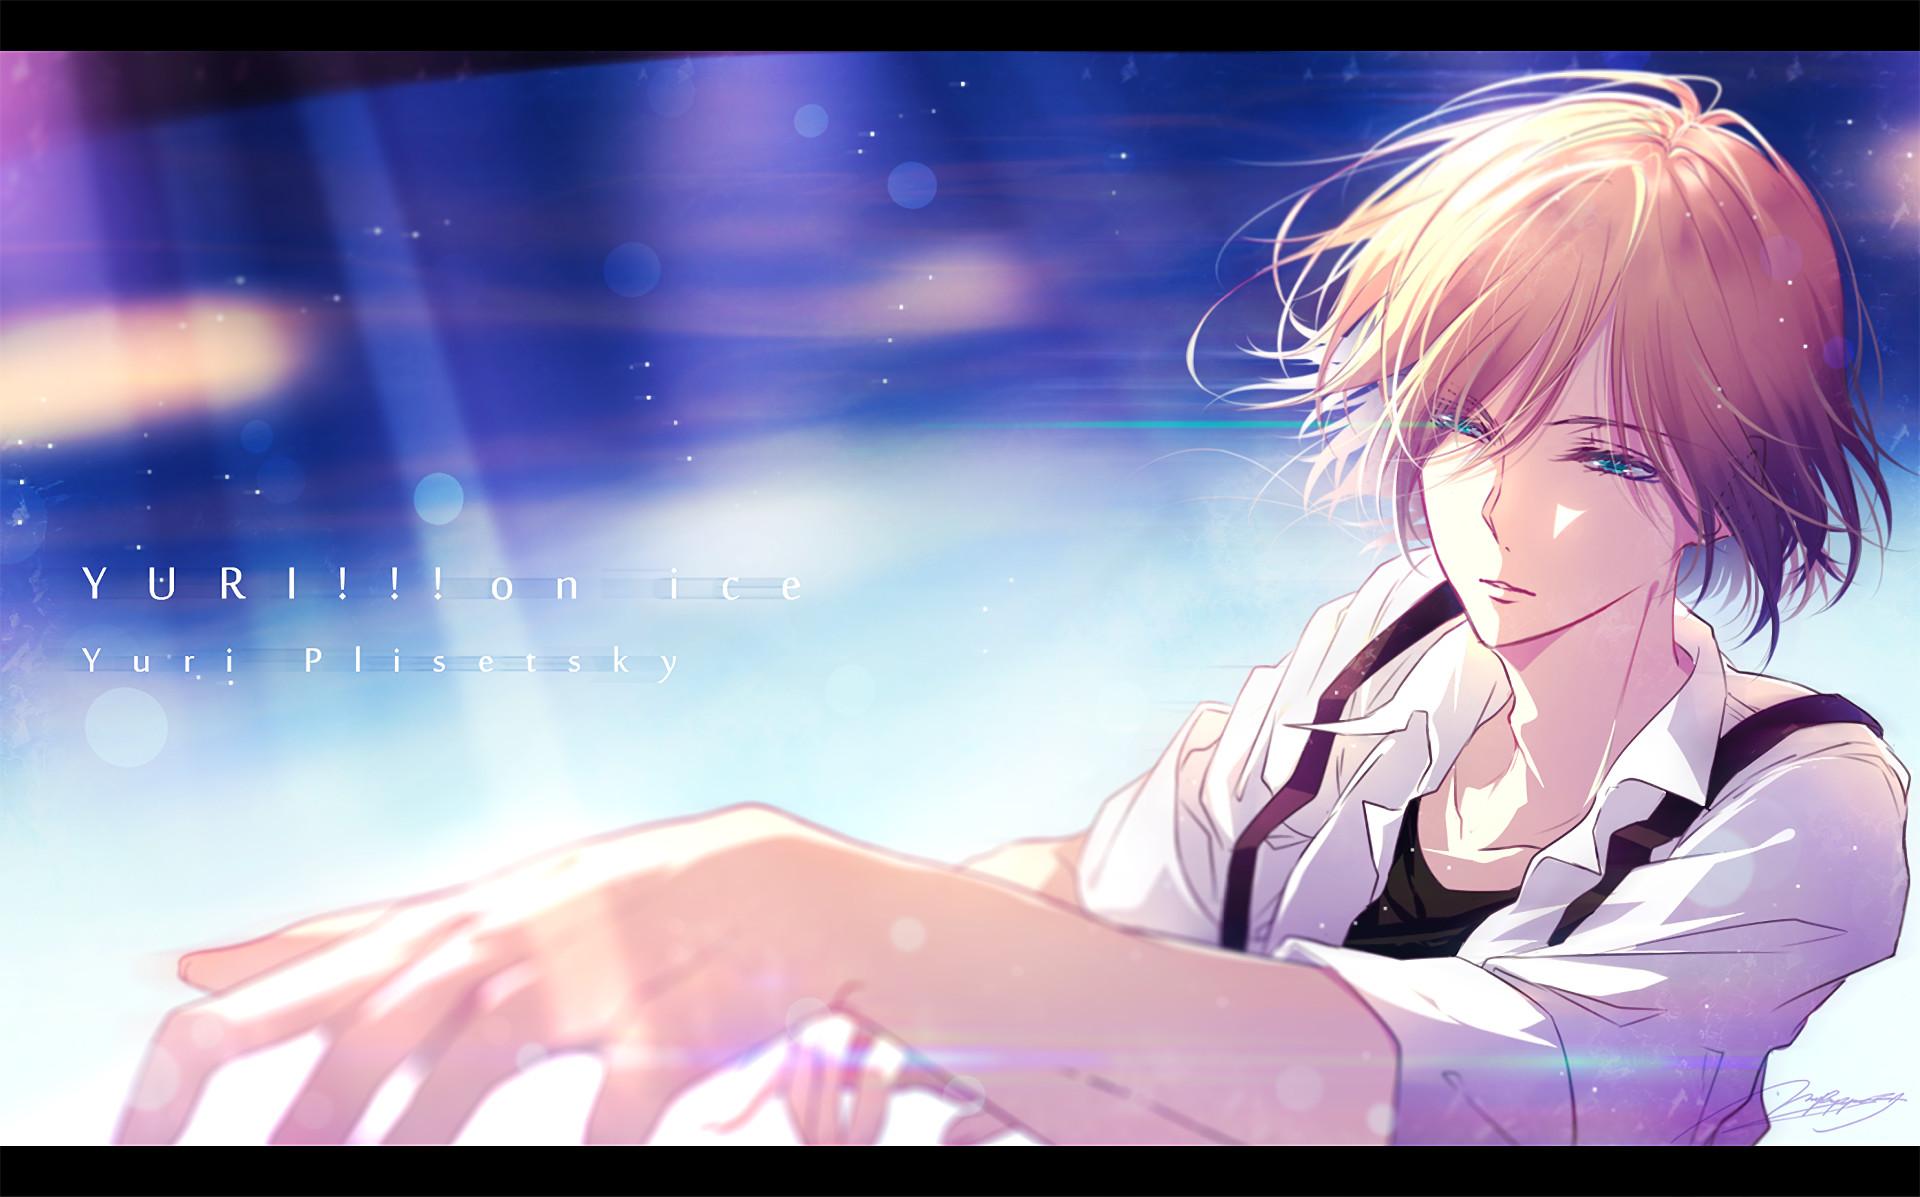 Anime – Yuri!!! on Ice Yuri Plisetsky Wallpaper